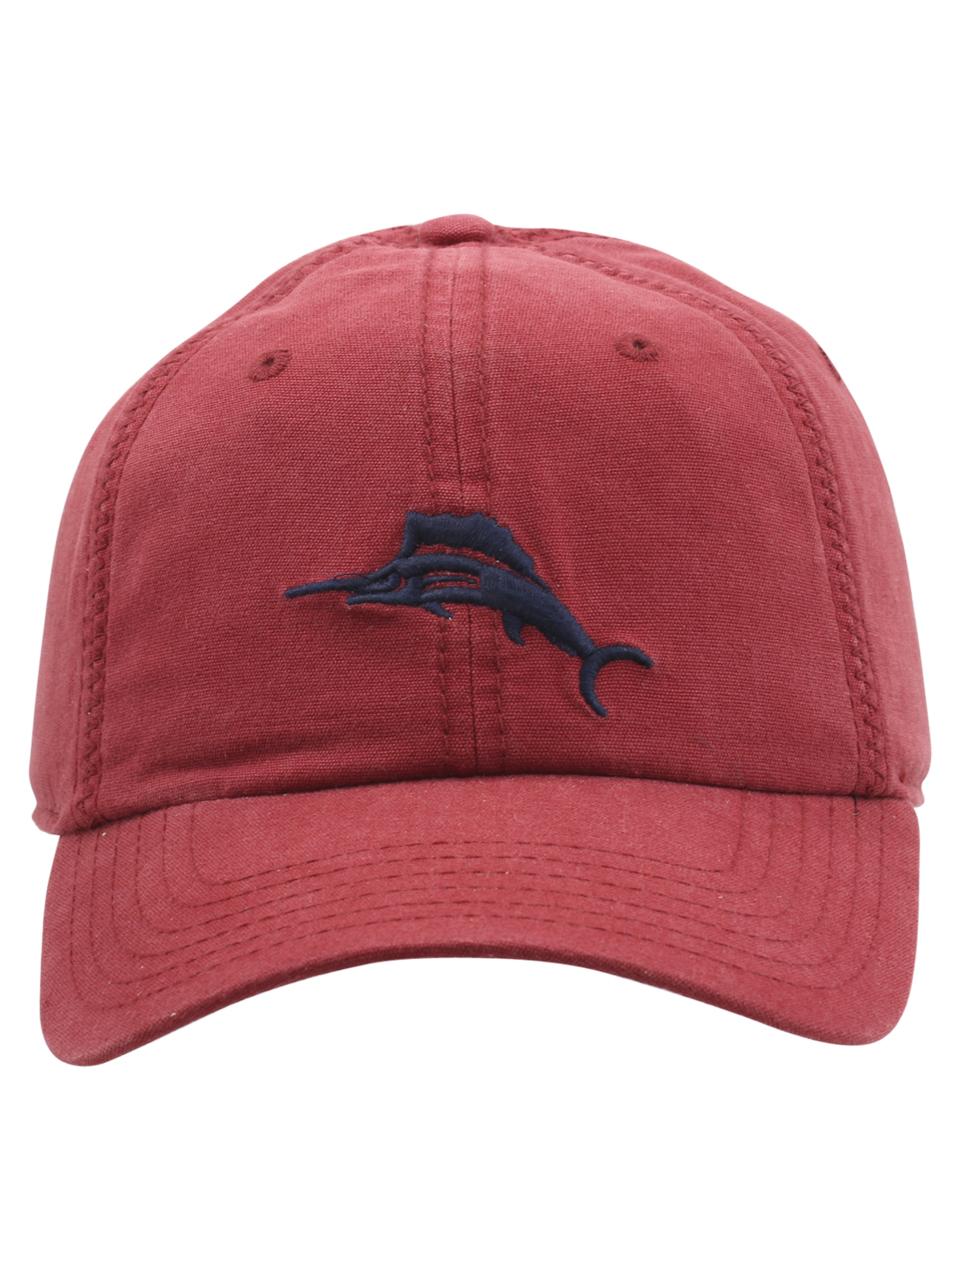 Tommy Bahama Strapback Cross-Stitch Baseball Cap Hat  7d205351b61